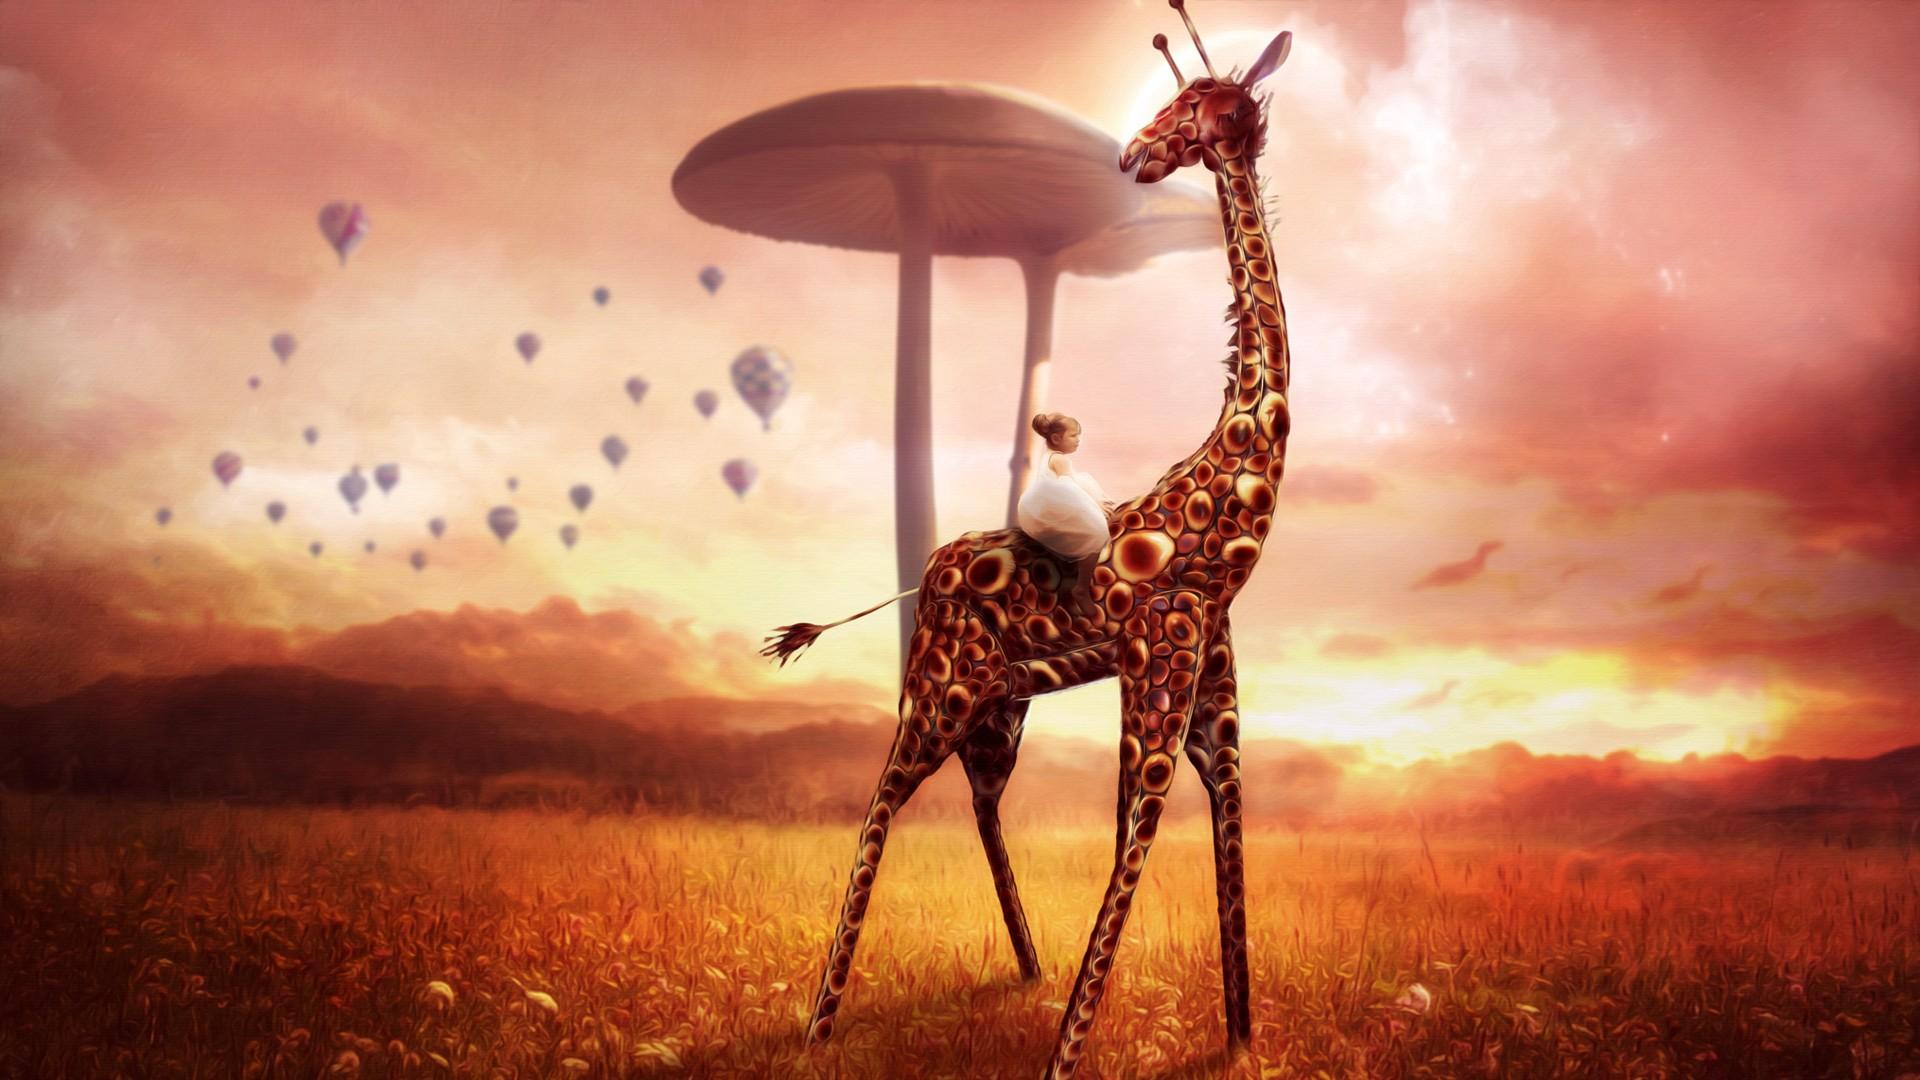 Giraffe Dream Fantasy HD Artist 4k Wallpapers Images Backgrounds